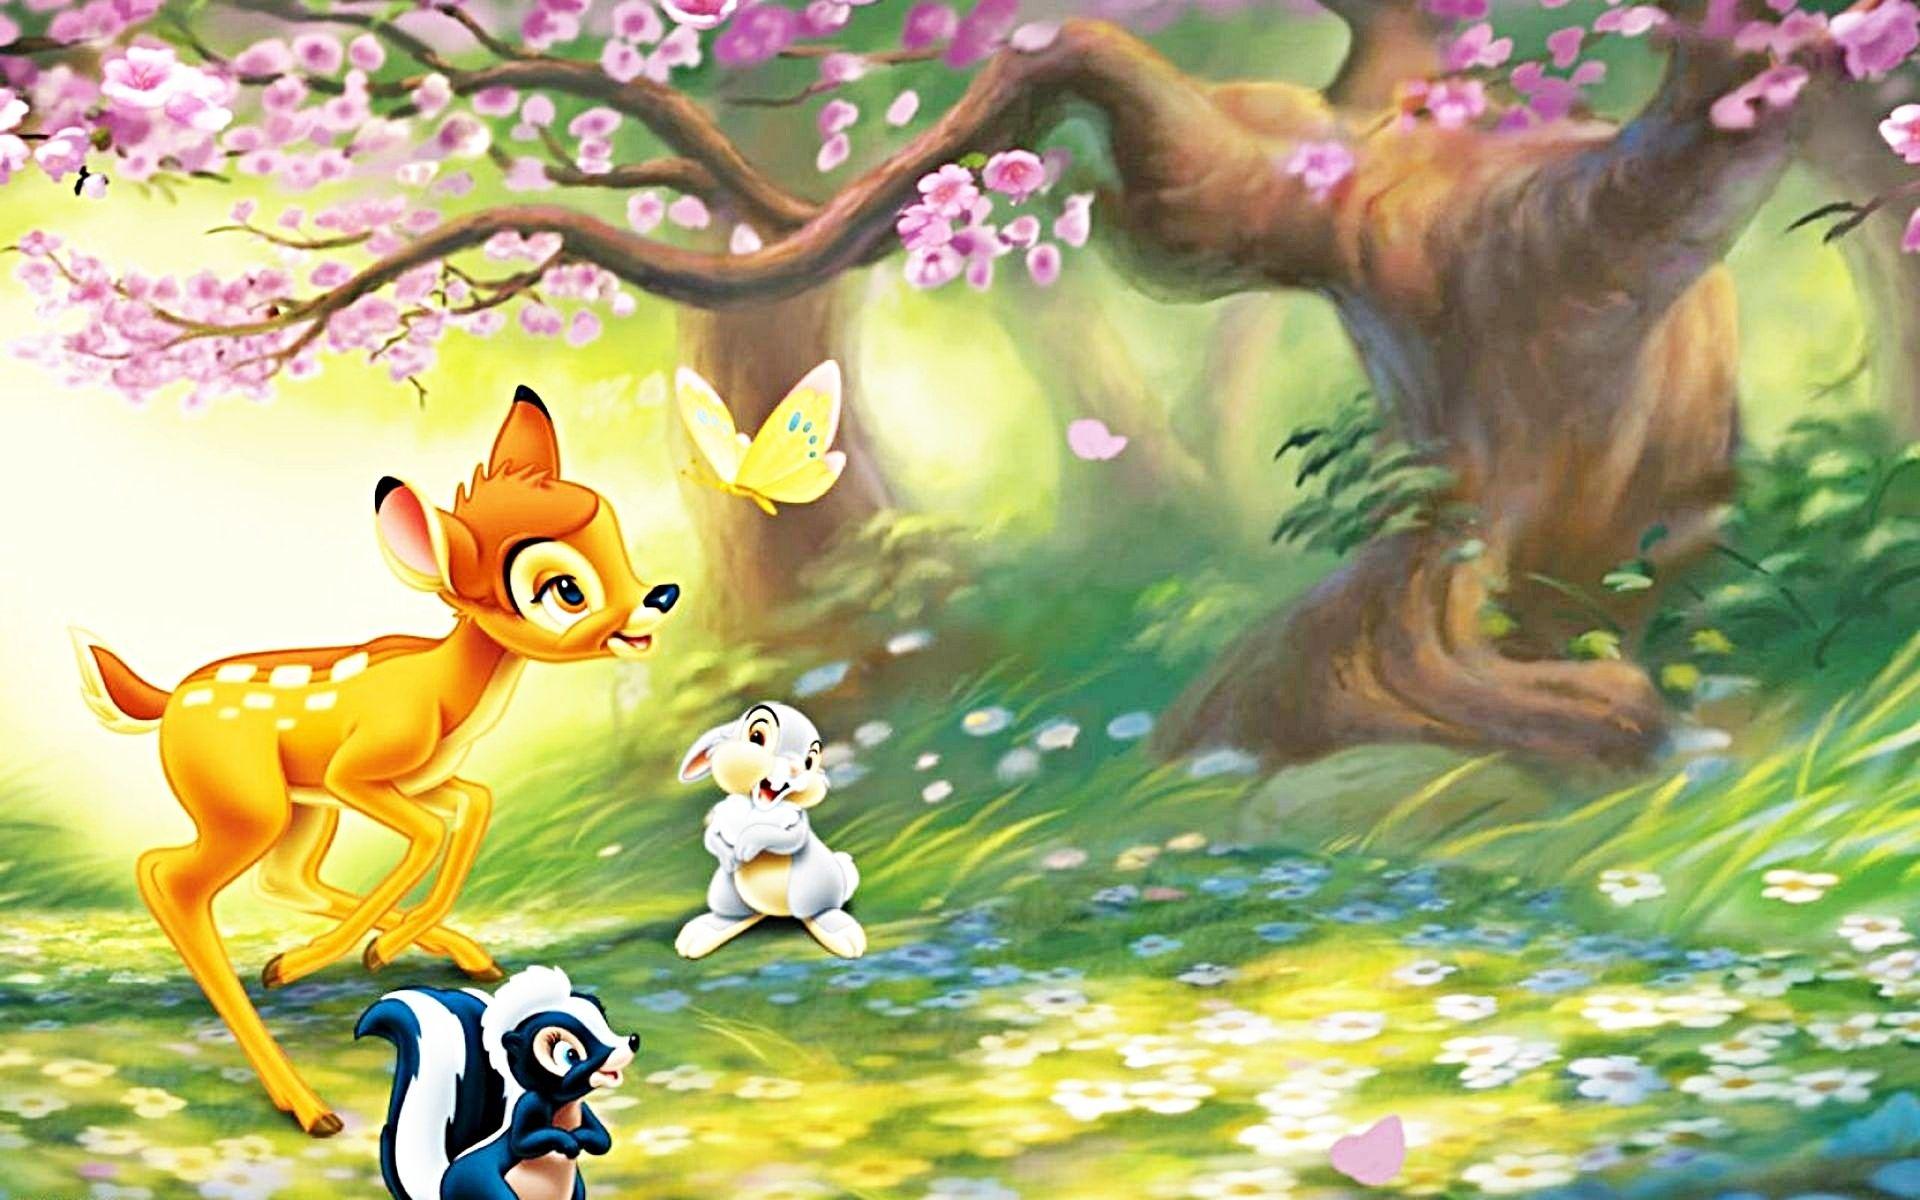 anime walt disney bambi for free image wallpaper download wallpaper